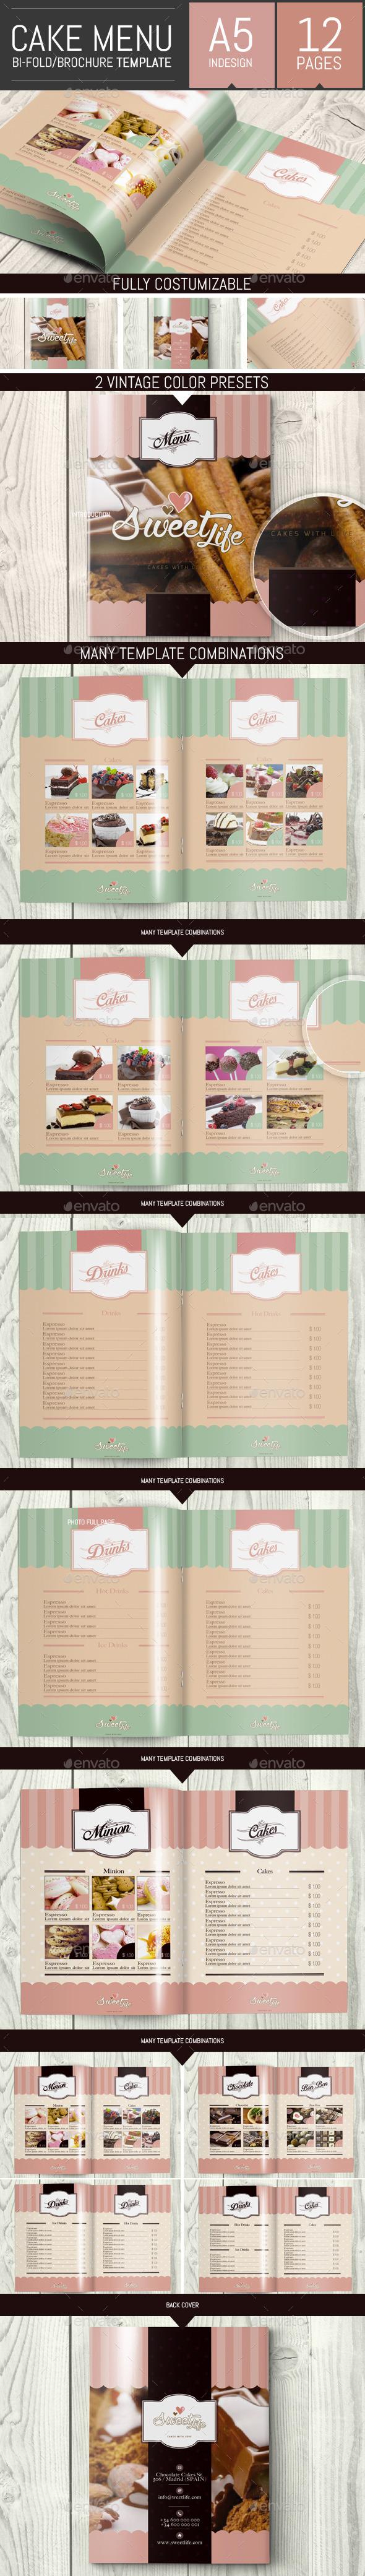 Vintage Cake Menu Brochure / Bi-fold Template - Food Menus Print Templates